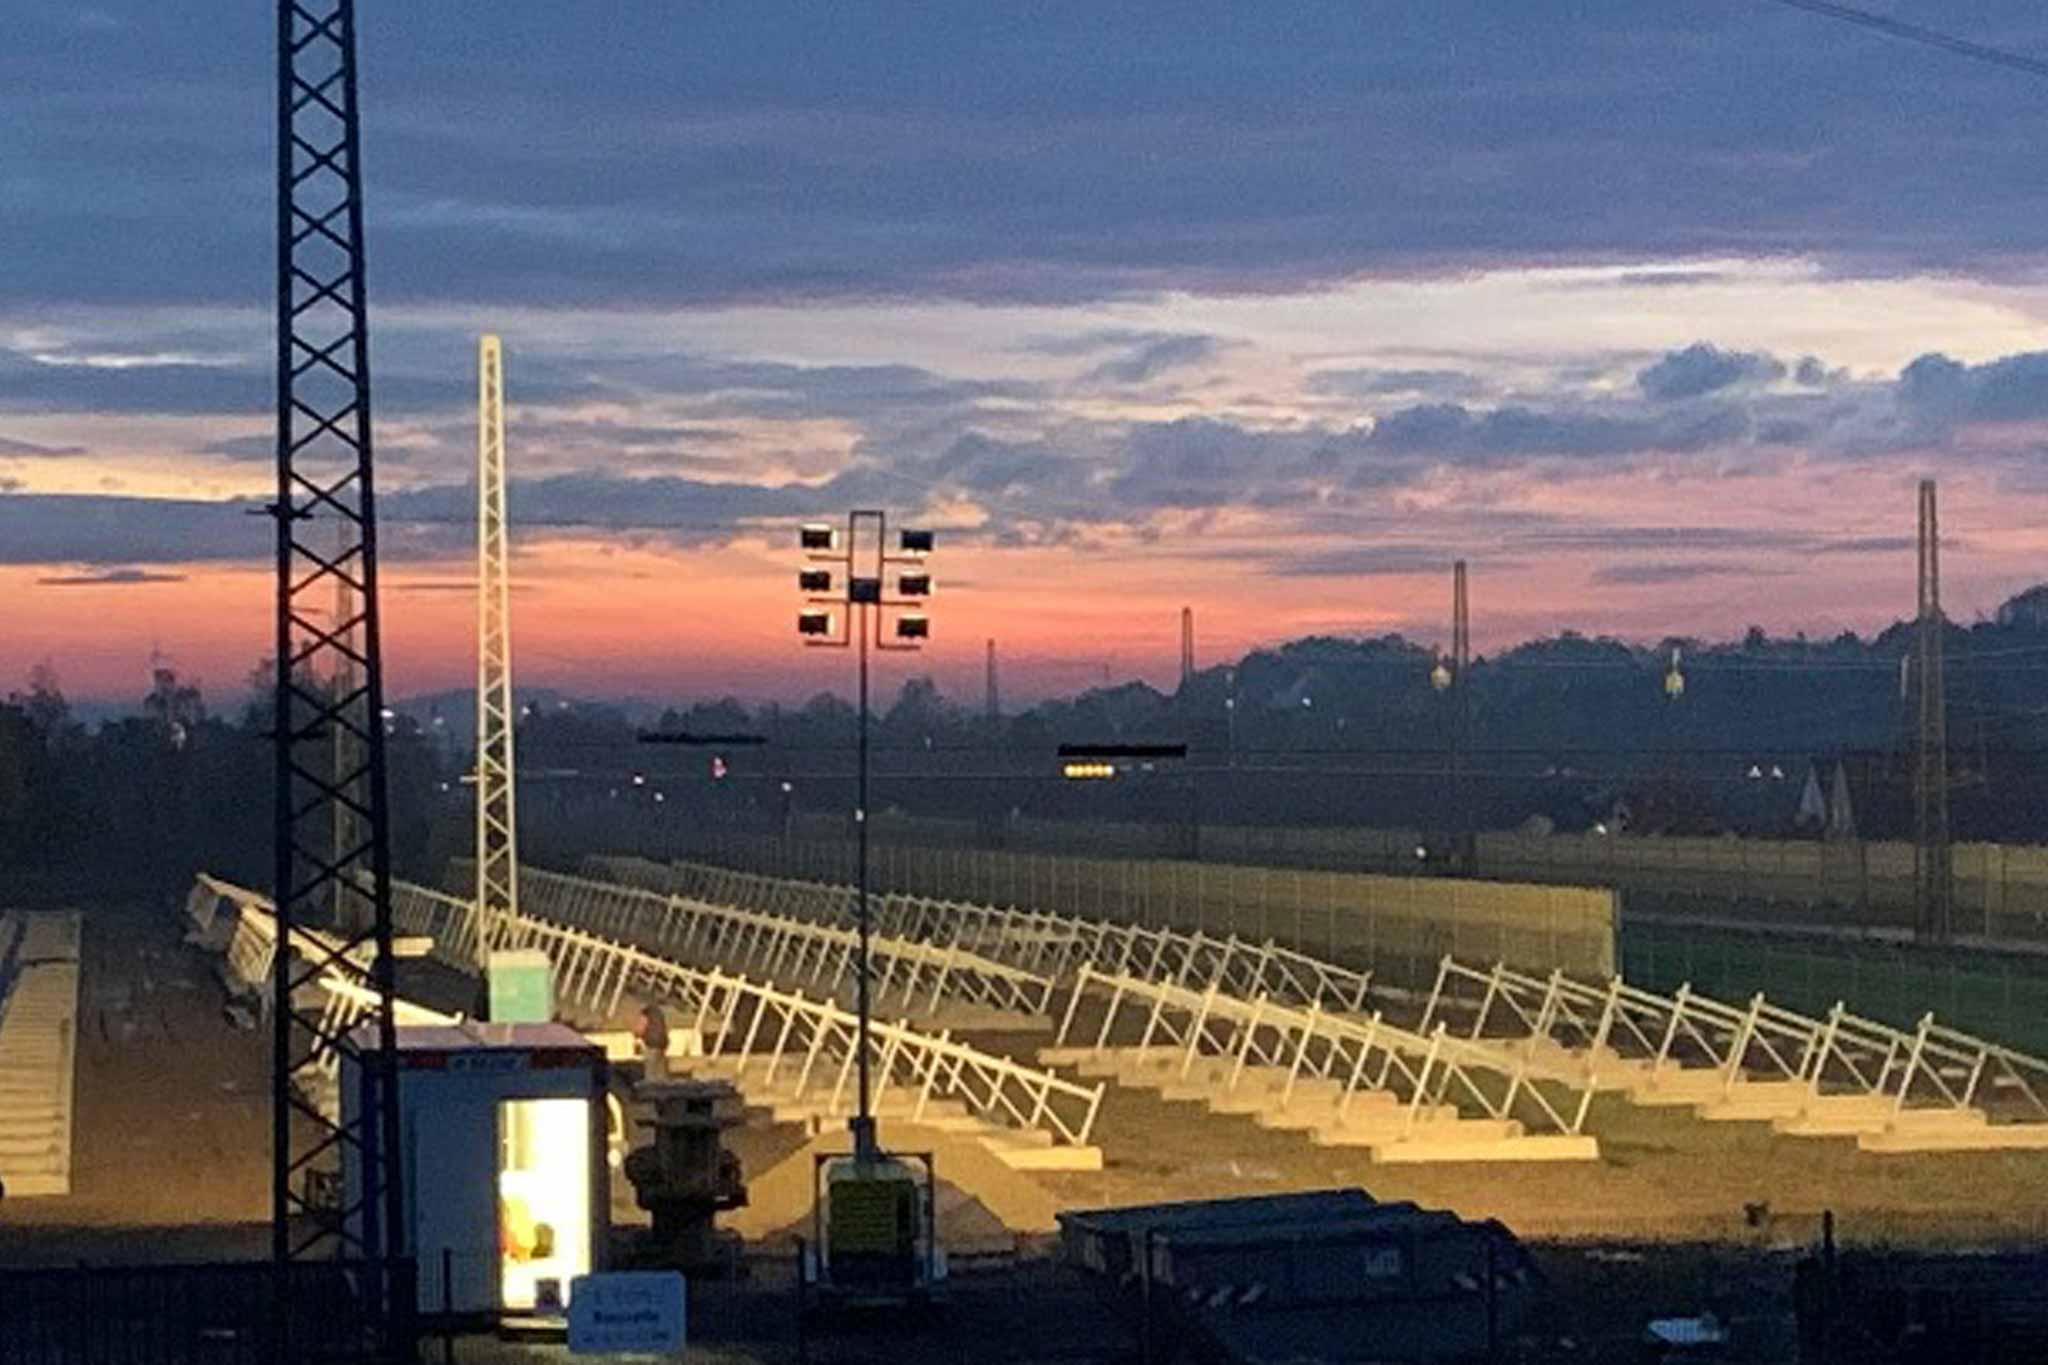 Freiland-Photovoltaikanlage bei Sonnenuntergang